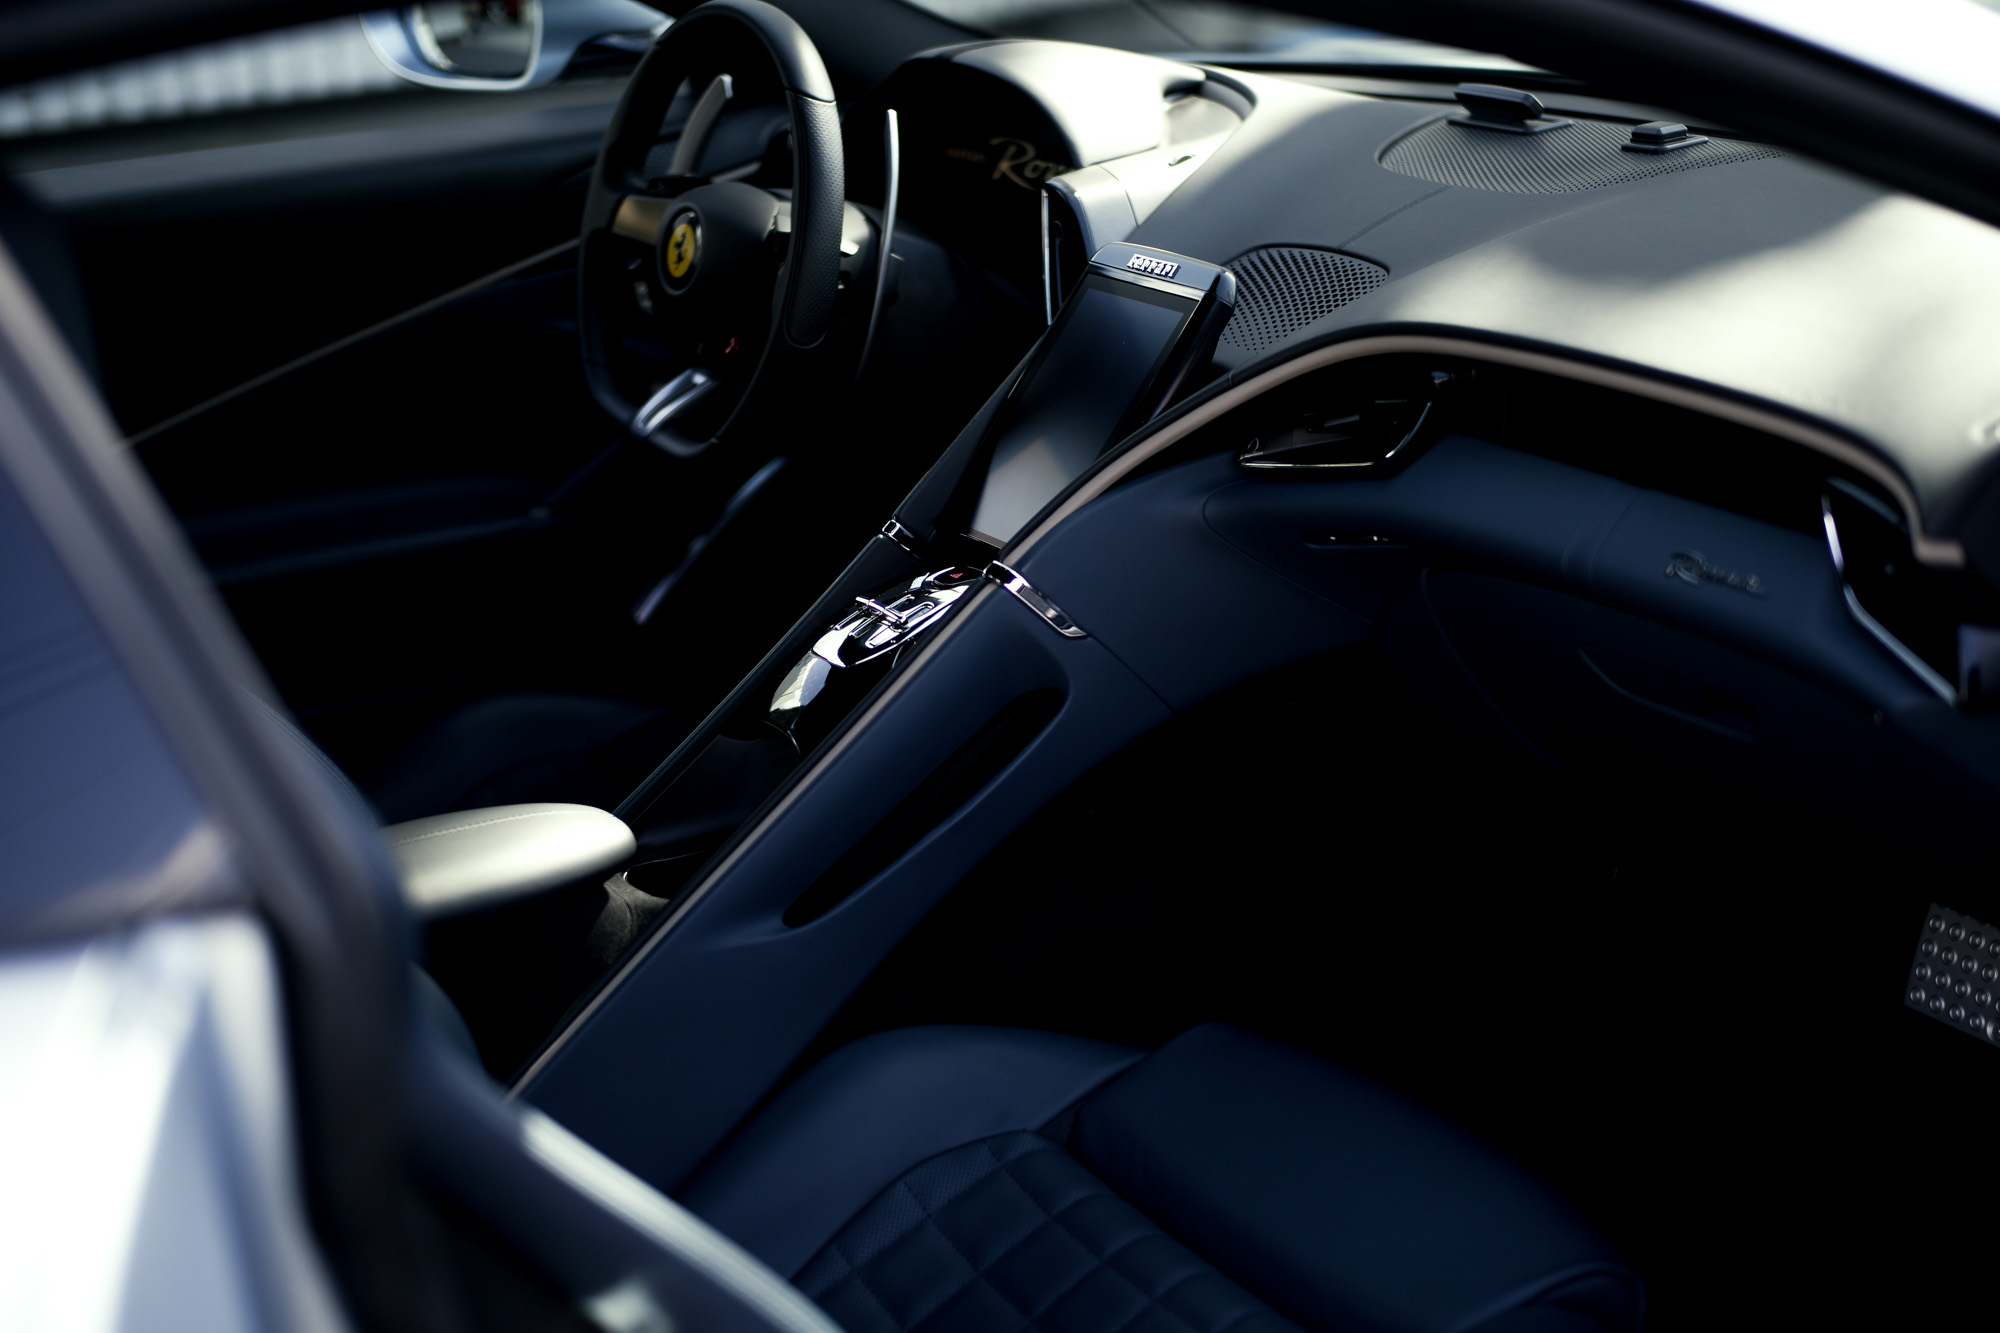 Ferrari Roma フェラーリ ローマ 新型クーペ  3.9 L V8 愛知 名古屋